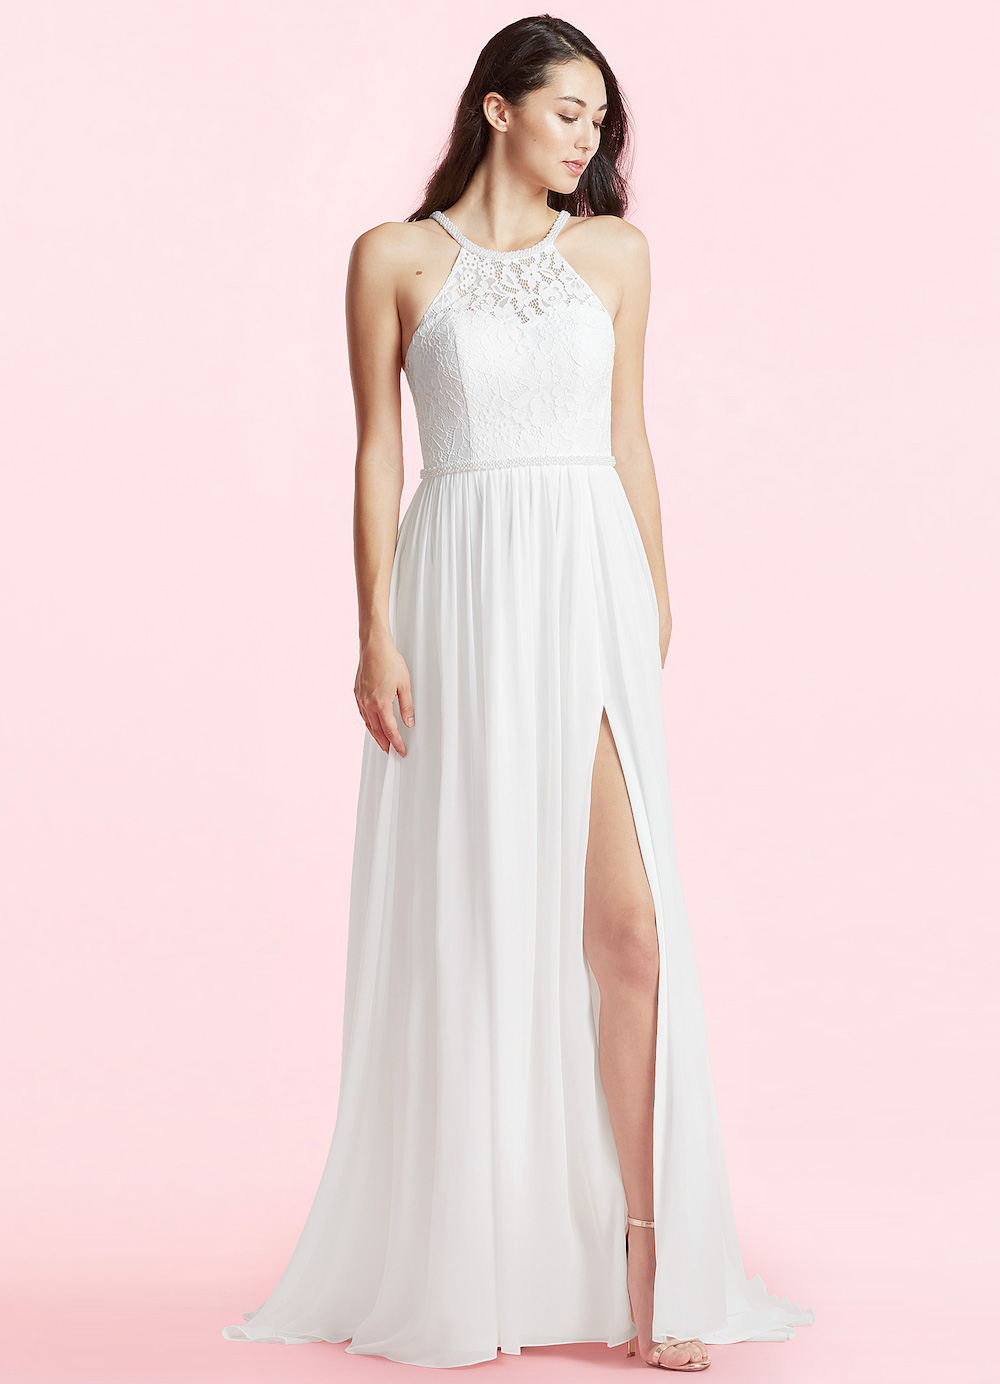 Bridal Market 2017 Trends , 2018 bridal fashion trends, wedding dress trends 2018